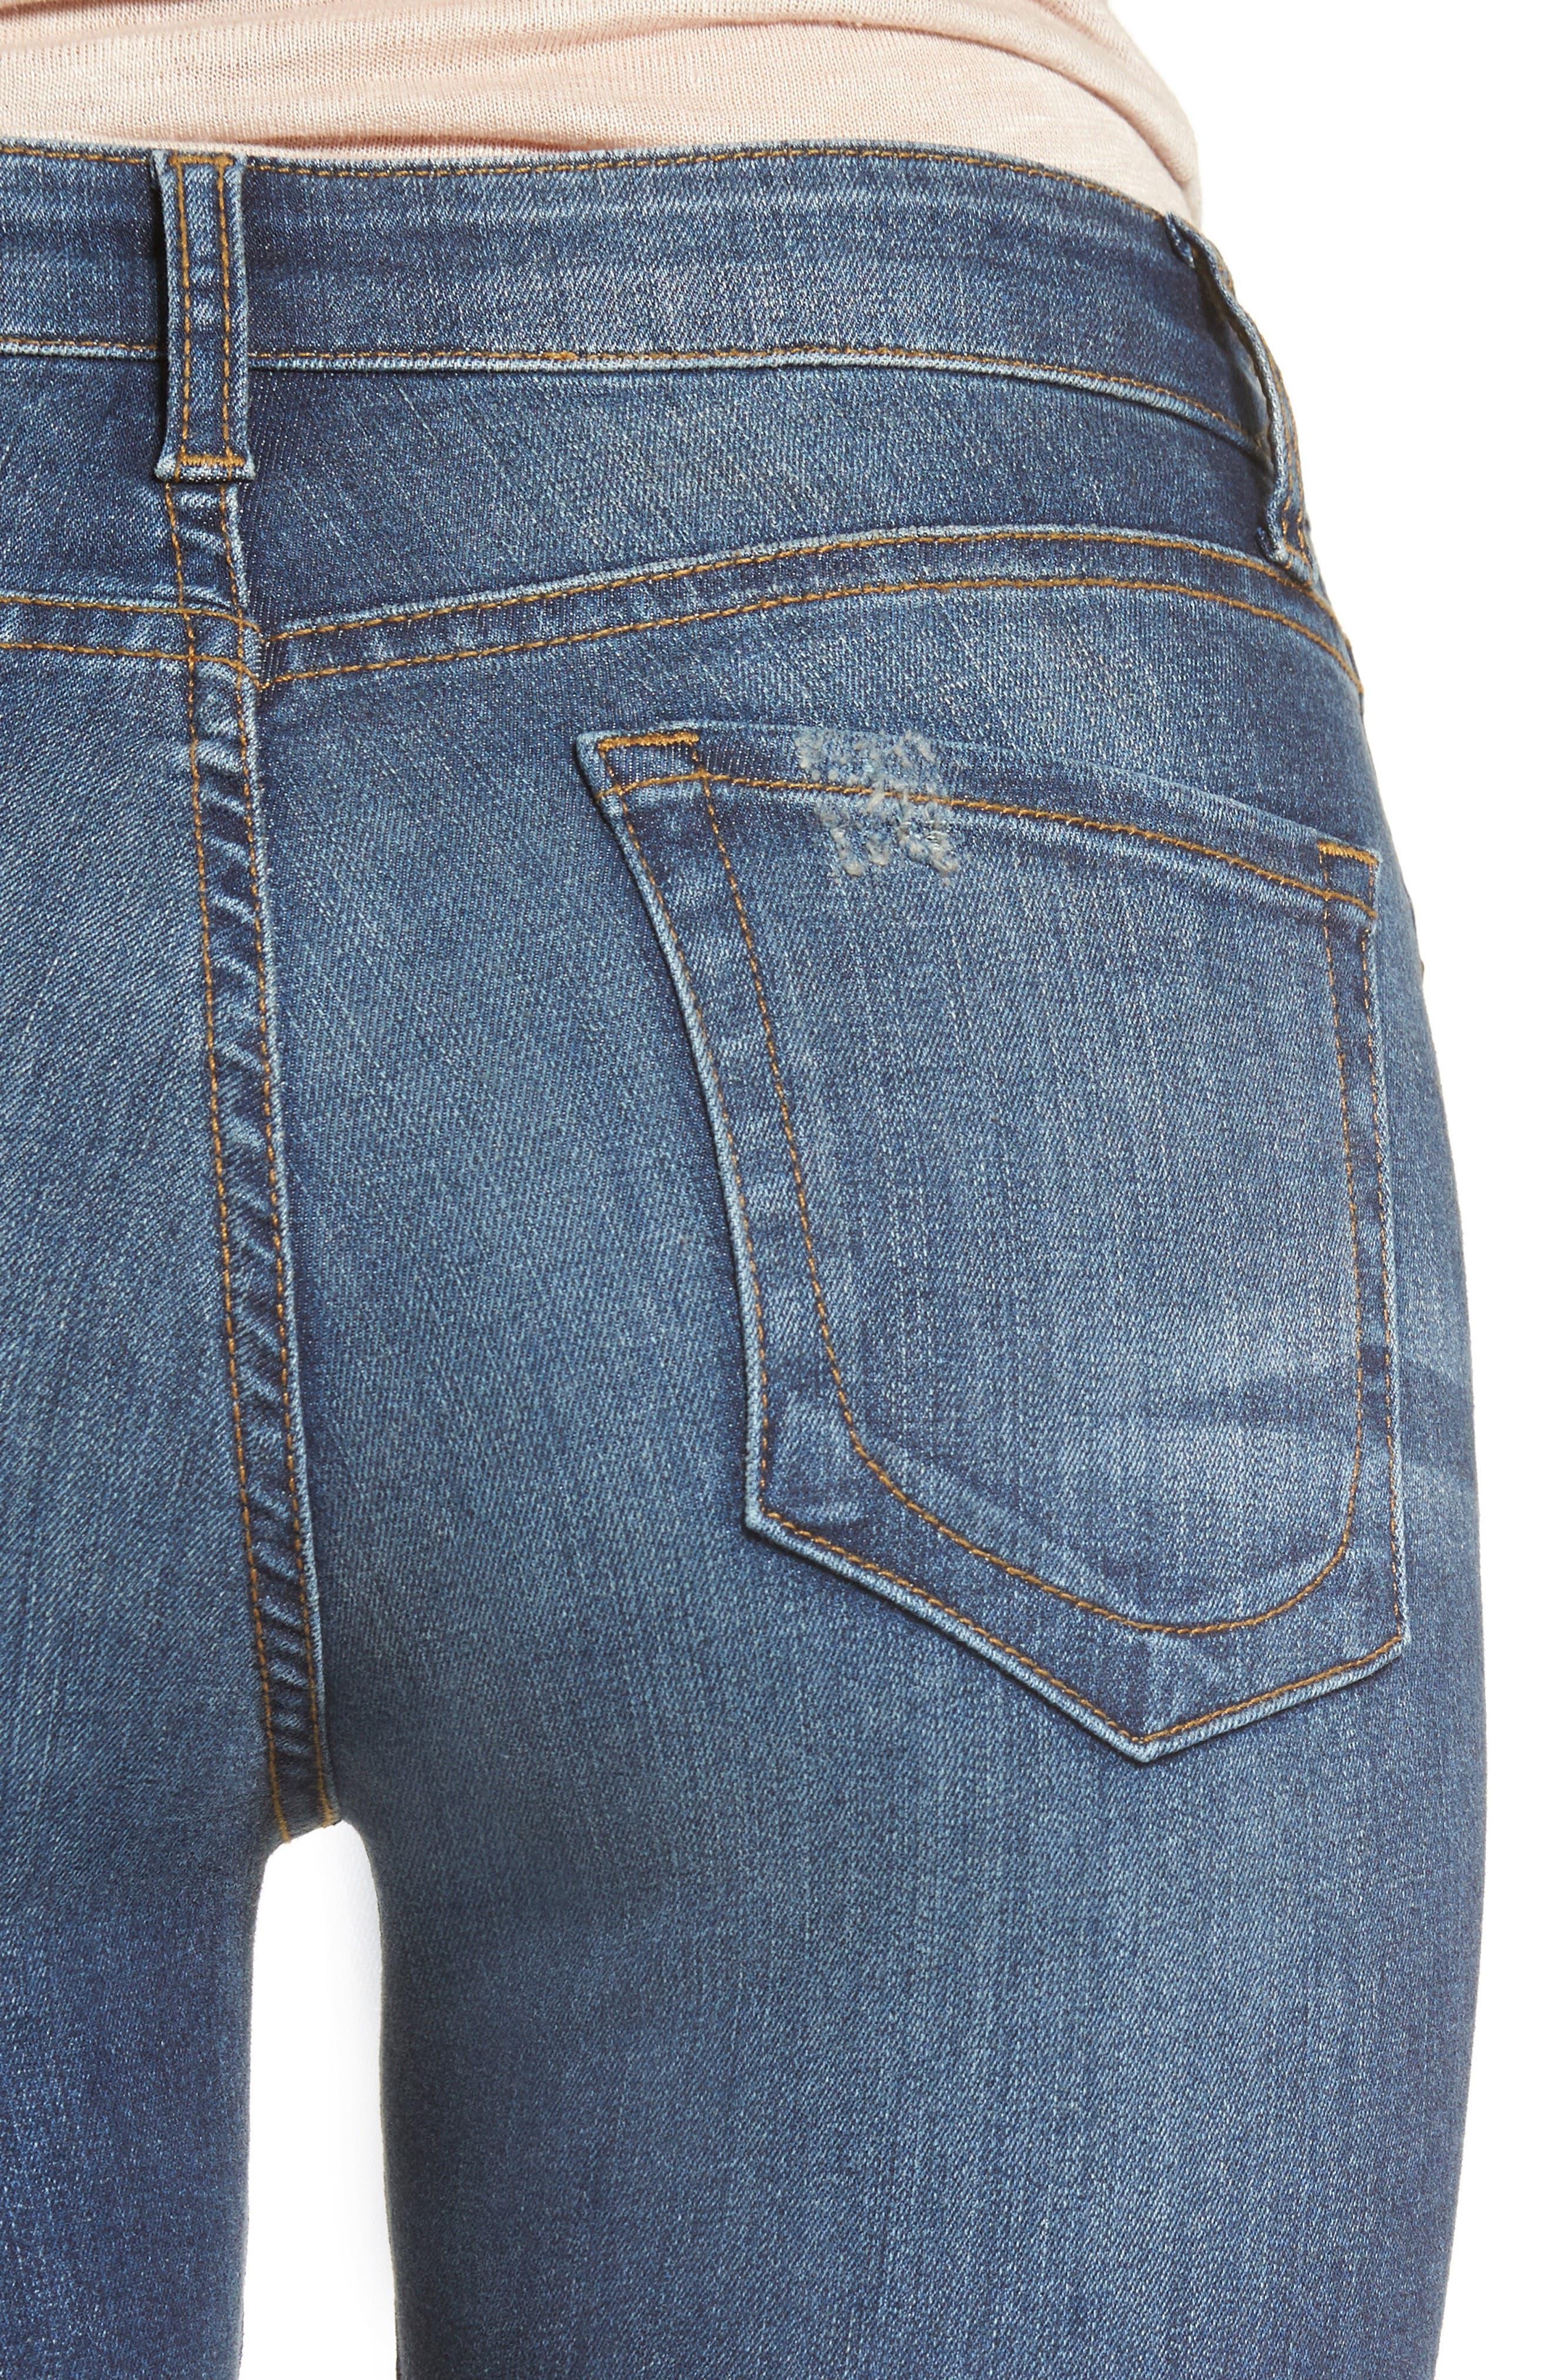 Alternate Image 5  - KUT from the Kloth Diana Ripped Stretch Skinny Jeans (Valorous) (Regular & Petite)